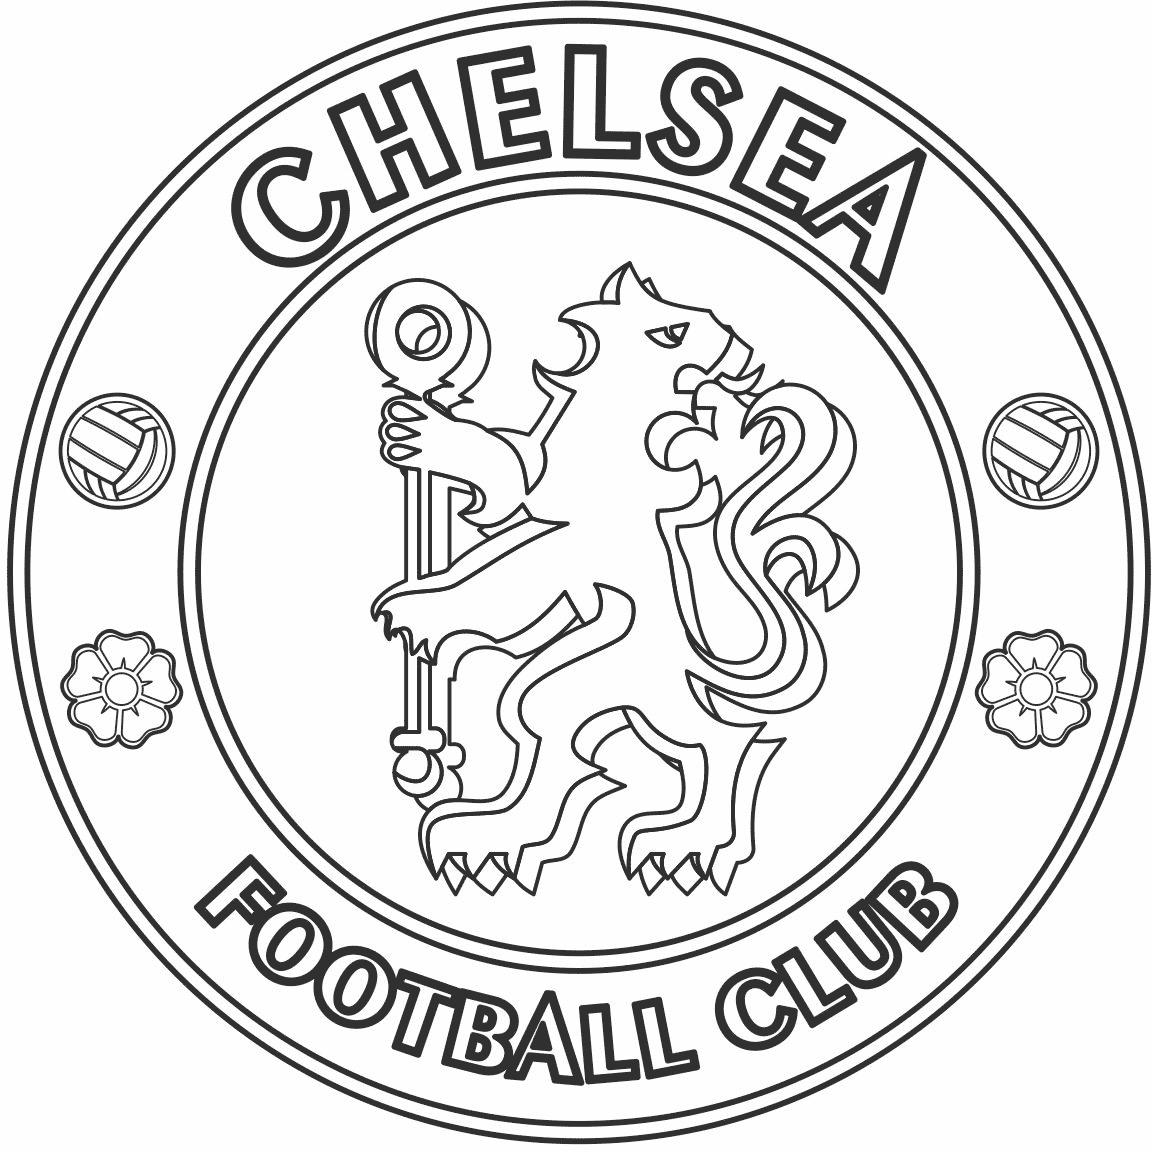 Símbolo do Chelsea para colorir